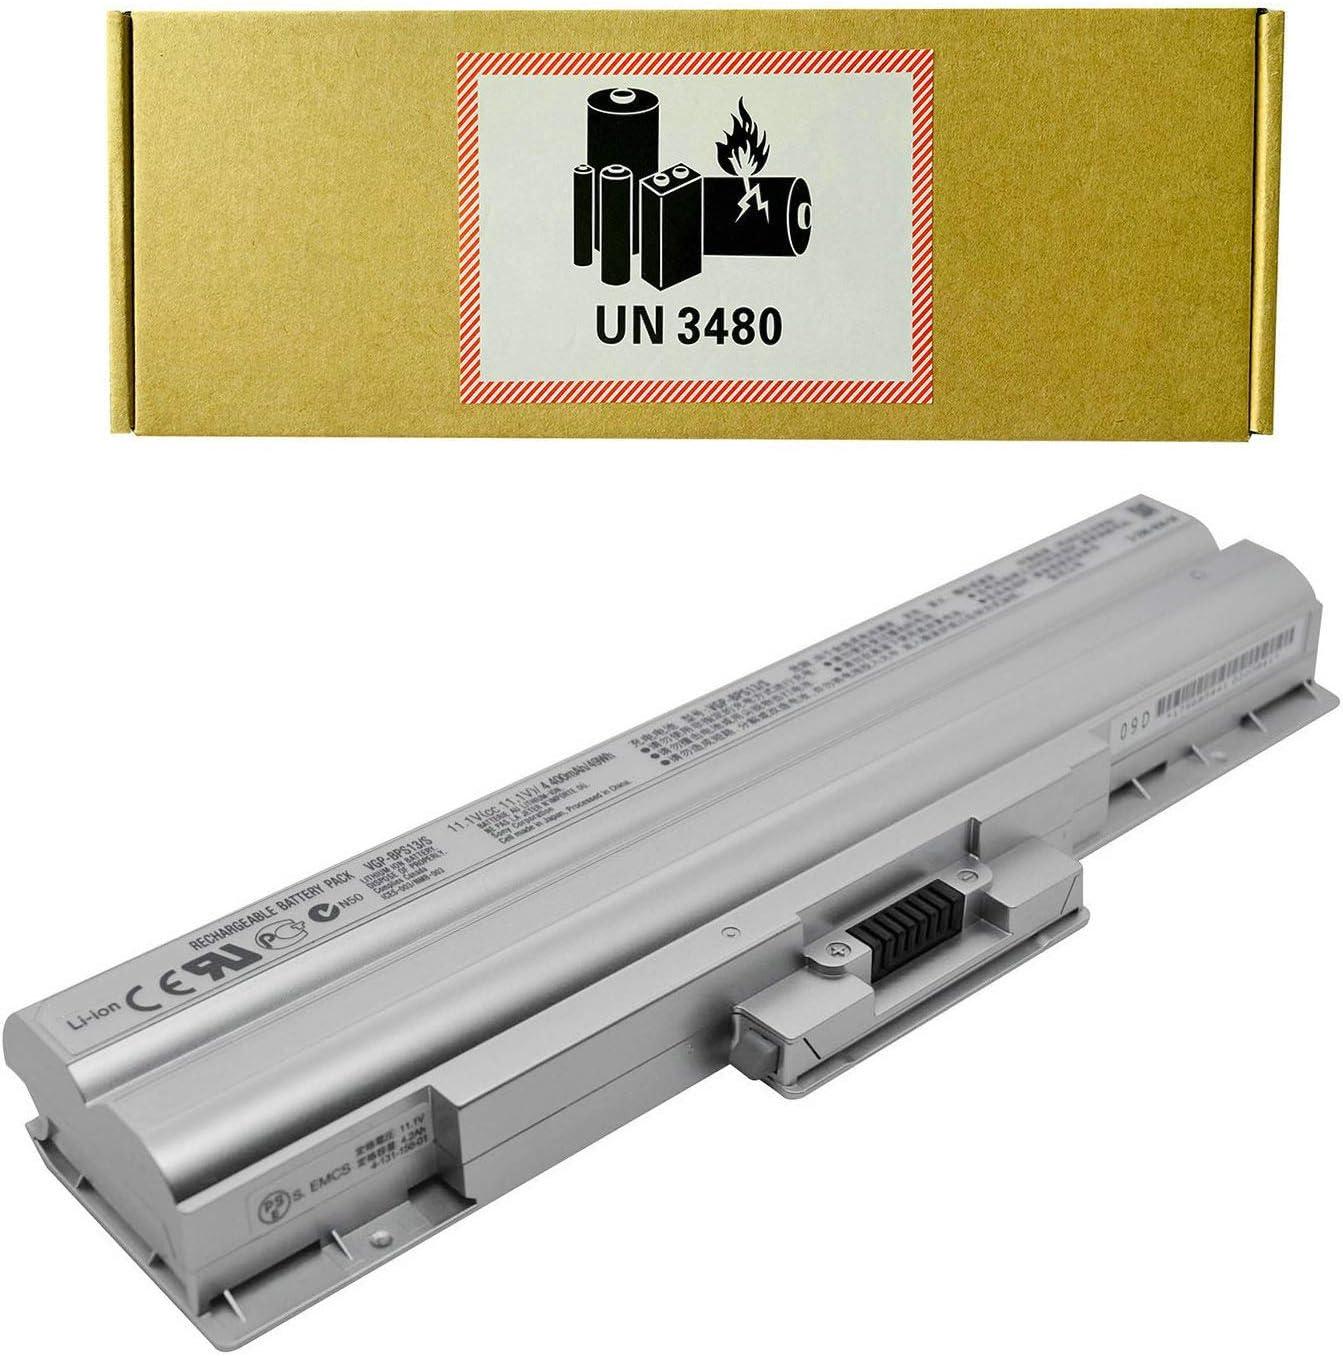 CQCQ VGP-BPS13 VGP-BPS13S BPS13 Compatible Battery Replacement for Sony VGP-BPS13/S VGP-BPS13A/S VGP-BPS13 VGP-BPS13B/S Sony VAIO VGN-AW53FB VAIO VGN-AW73FB VAIO VGN-AW80S Laptop (11.1V 49Wh/4400mAh)